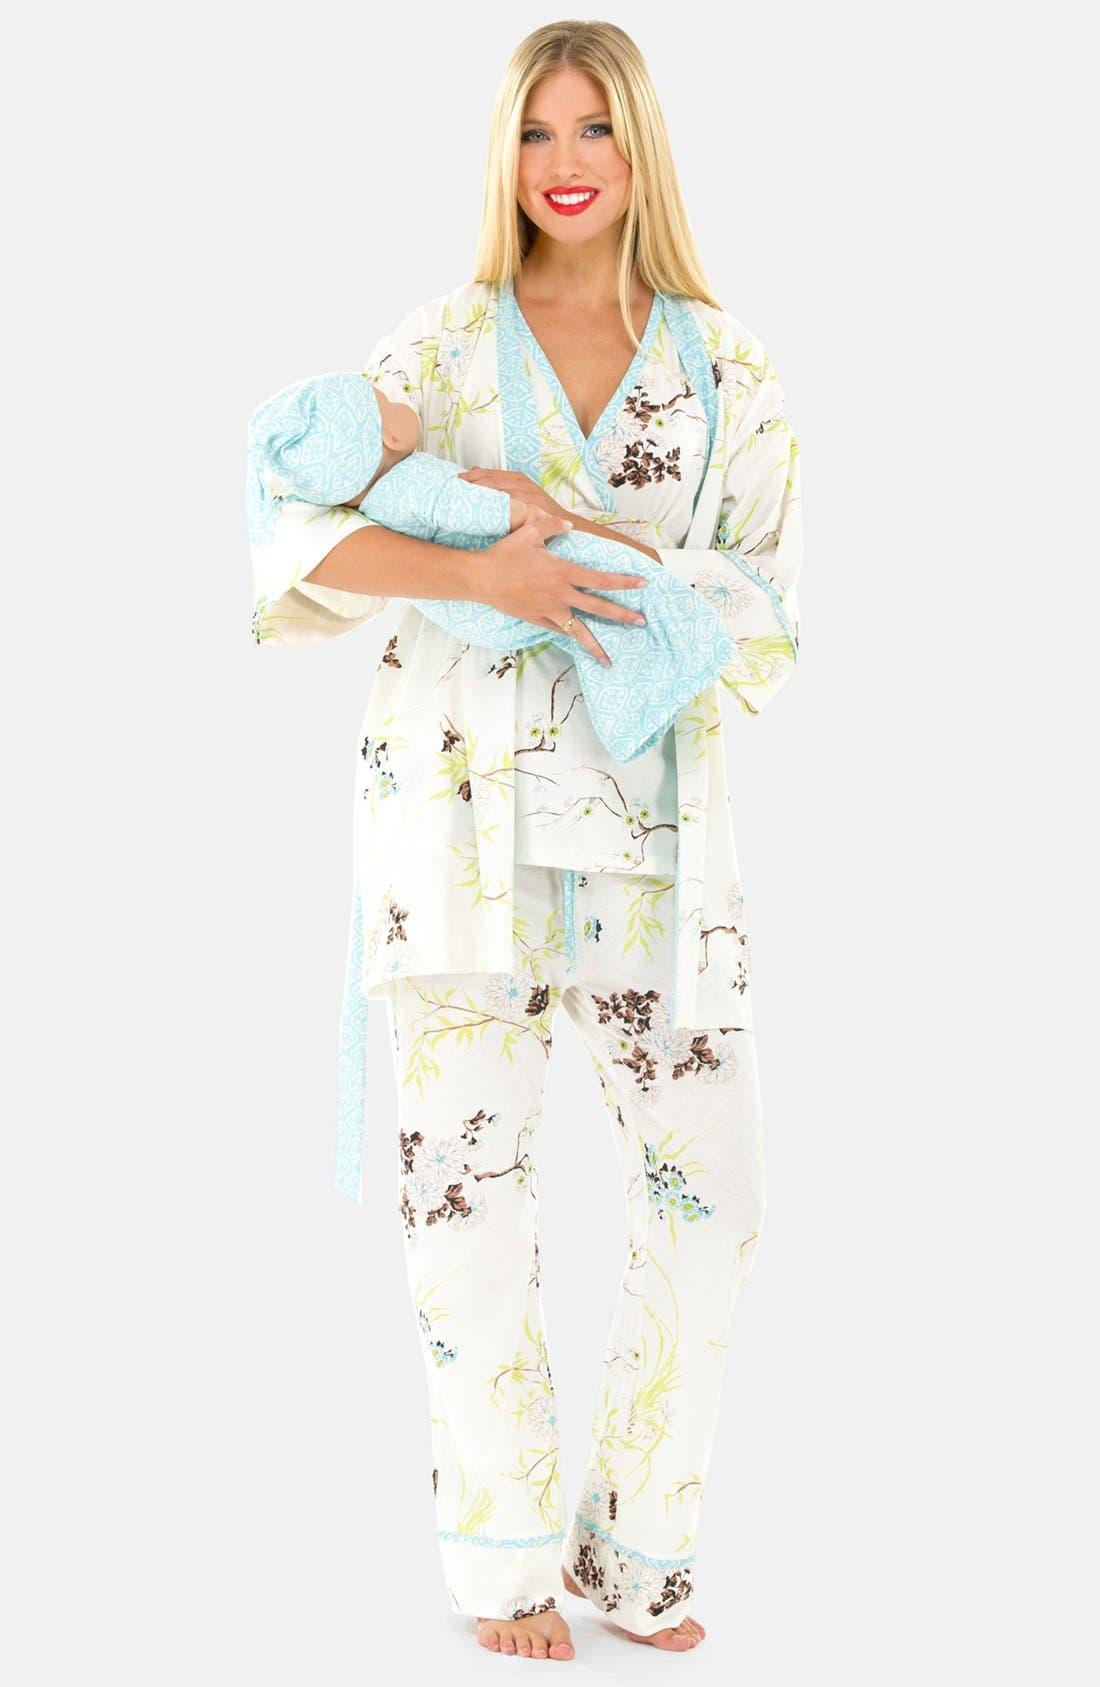 Olian maternity dresses nordstrom ombrellifo Choice Image